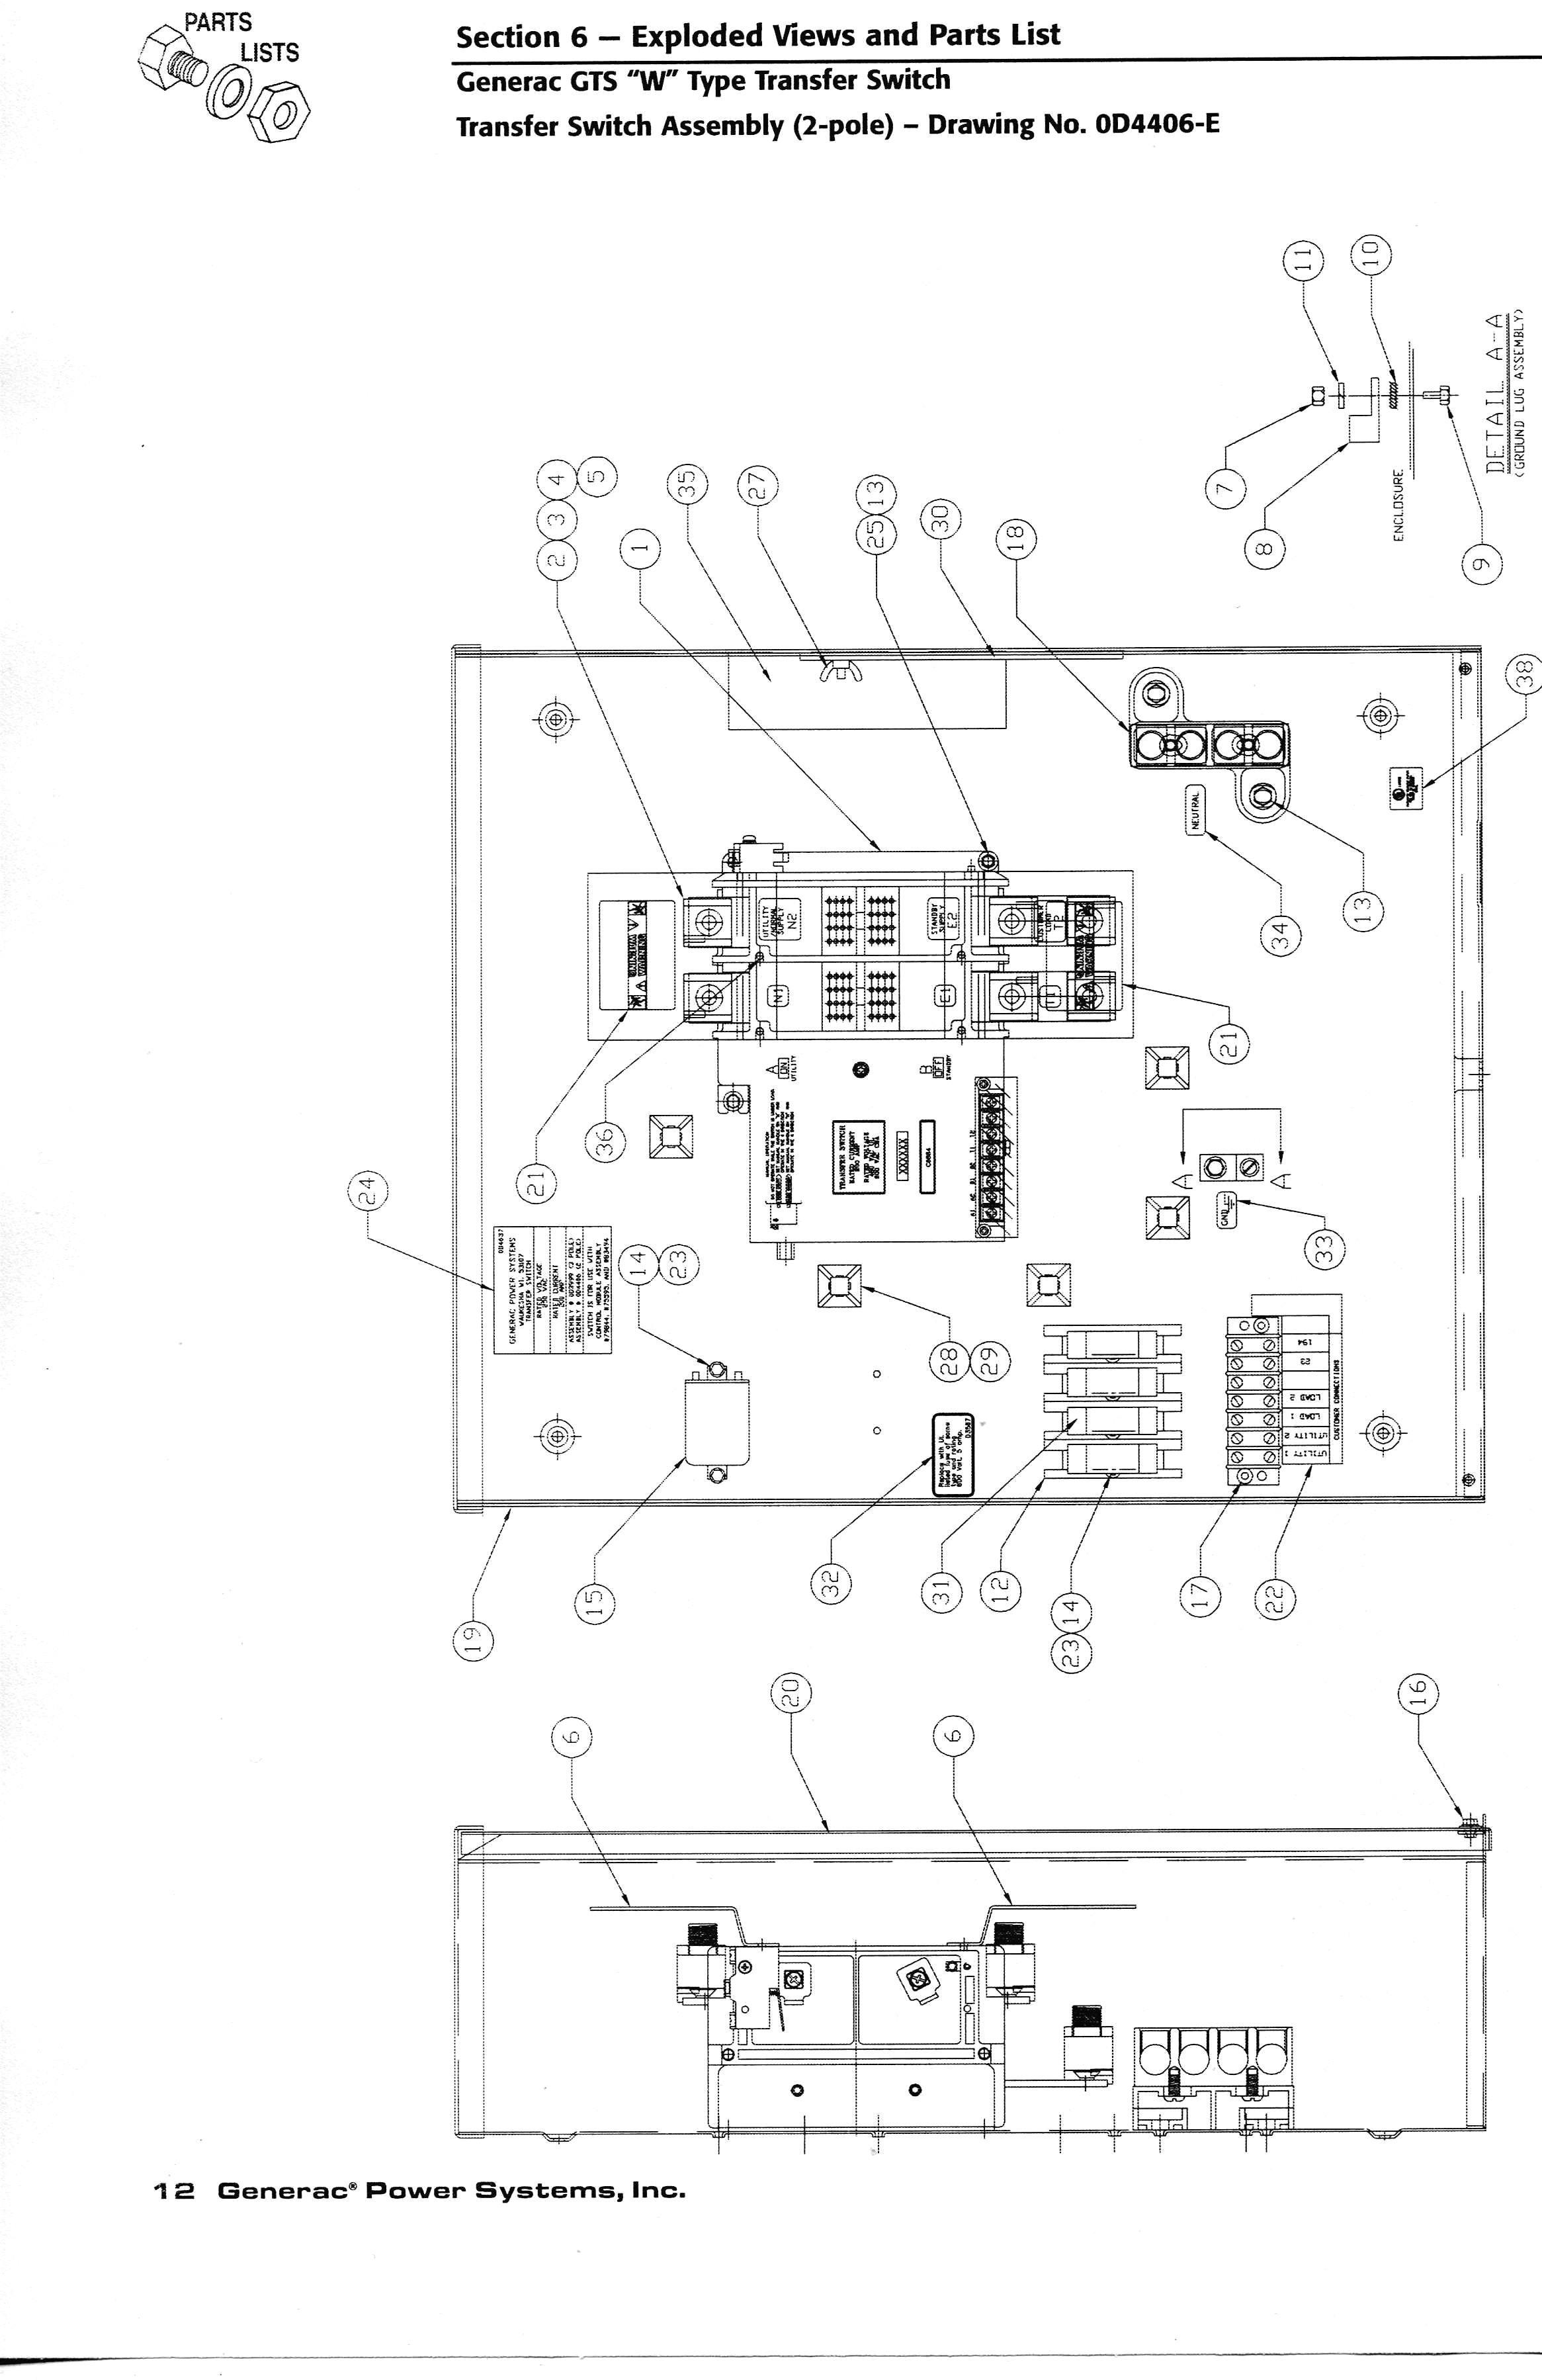 Transfer Switch Wiring Diagram Generac Automatic Transfer Switch Wiring Diagram Wiring Diagram Of Transfer Switch Wiring Diagram